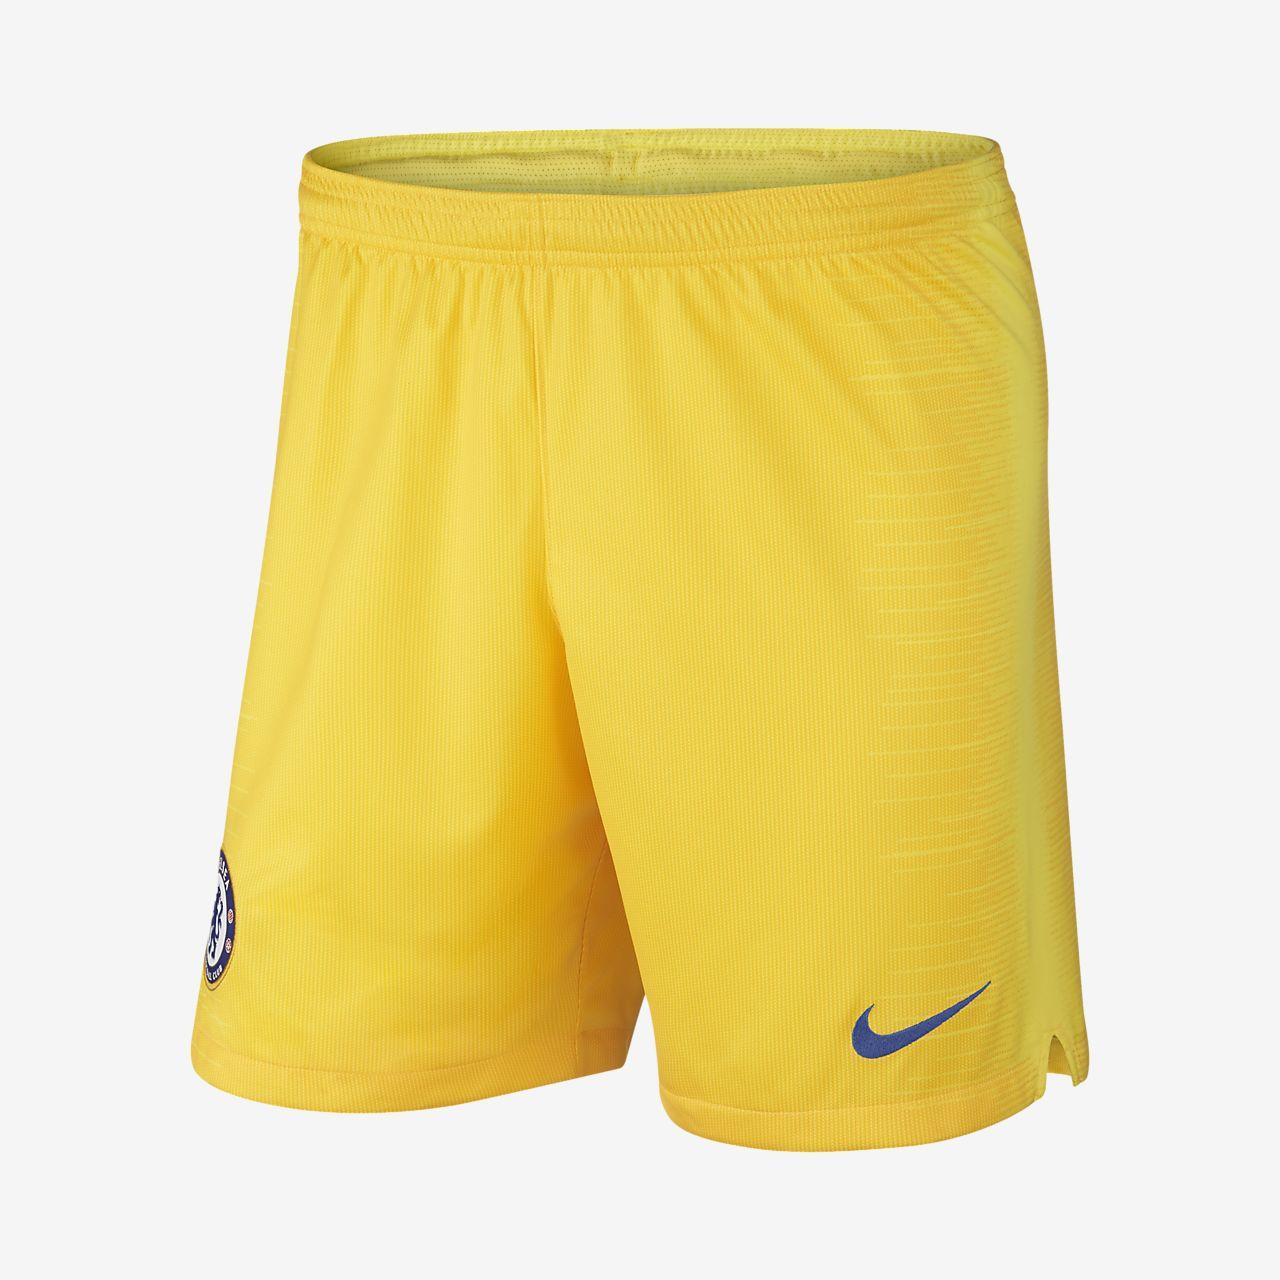 2018/19 Chelsea FC Stadium Home/Away Men's Football Shorts